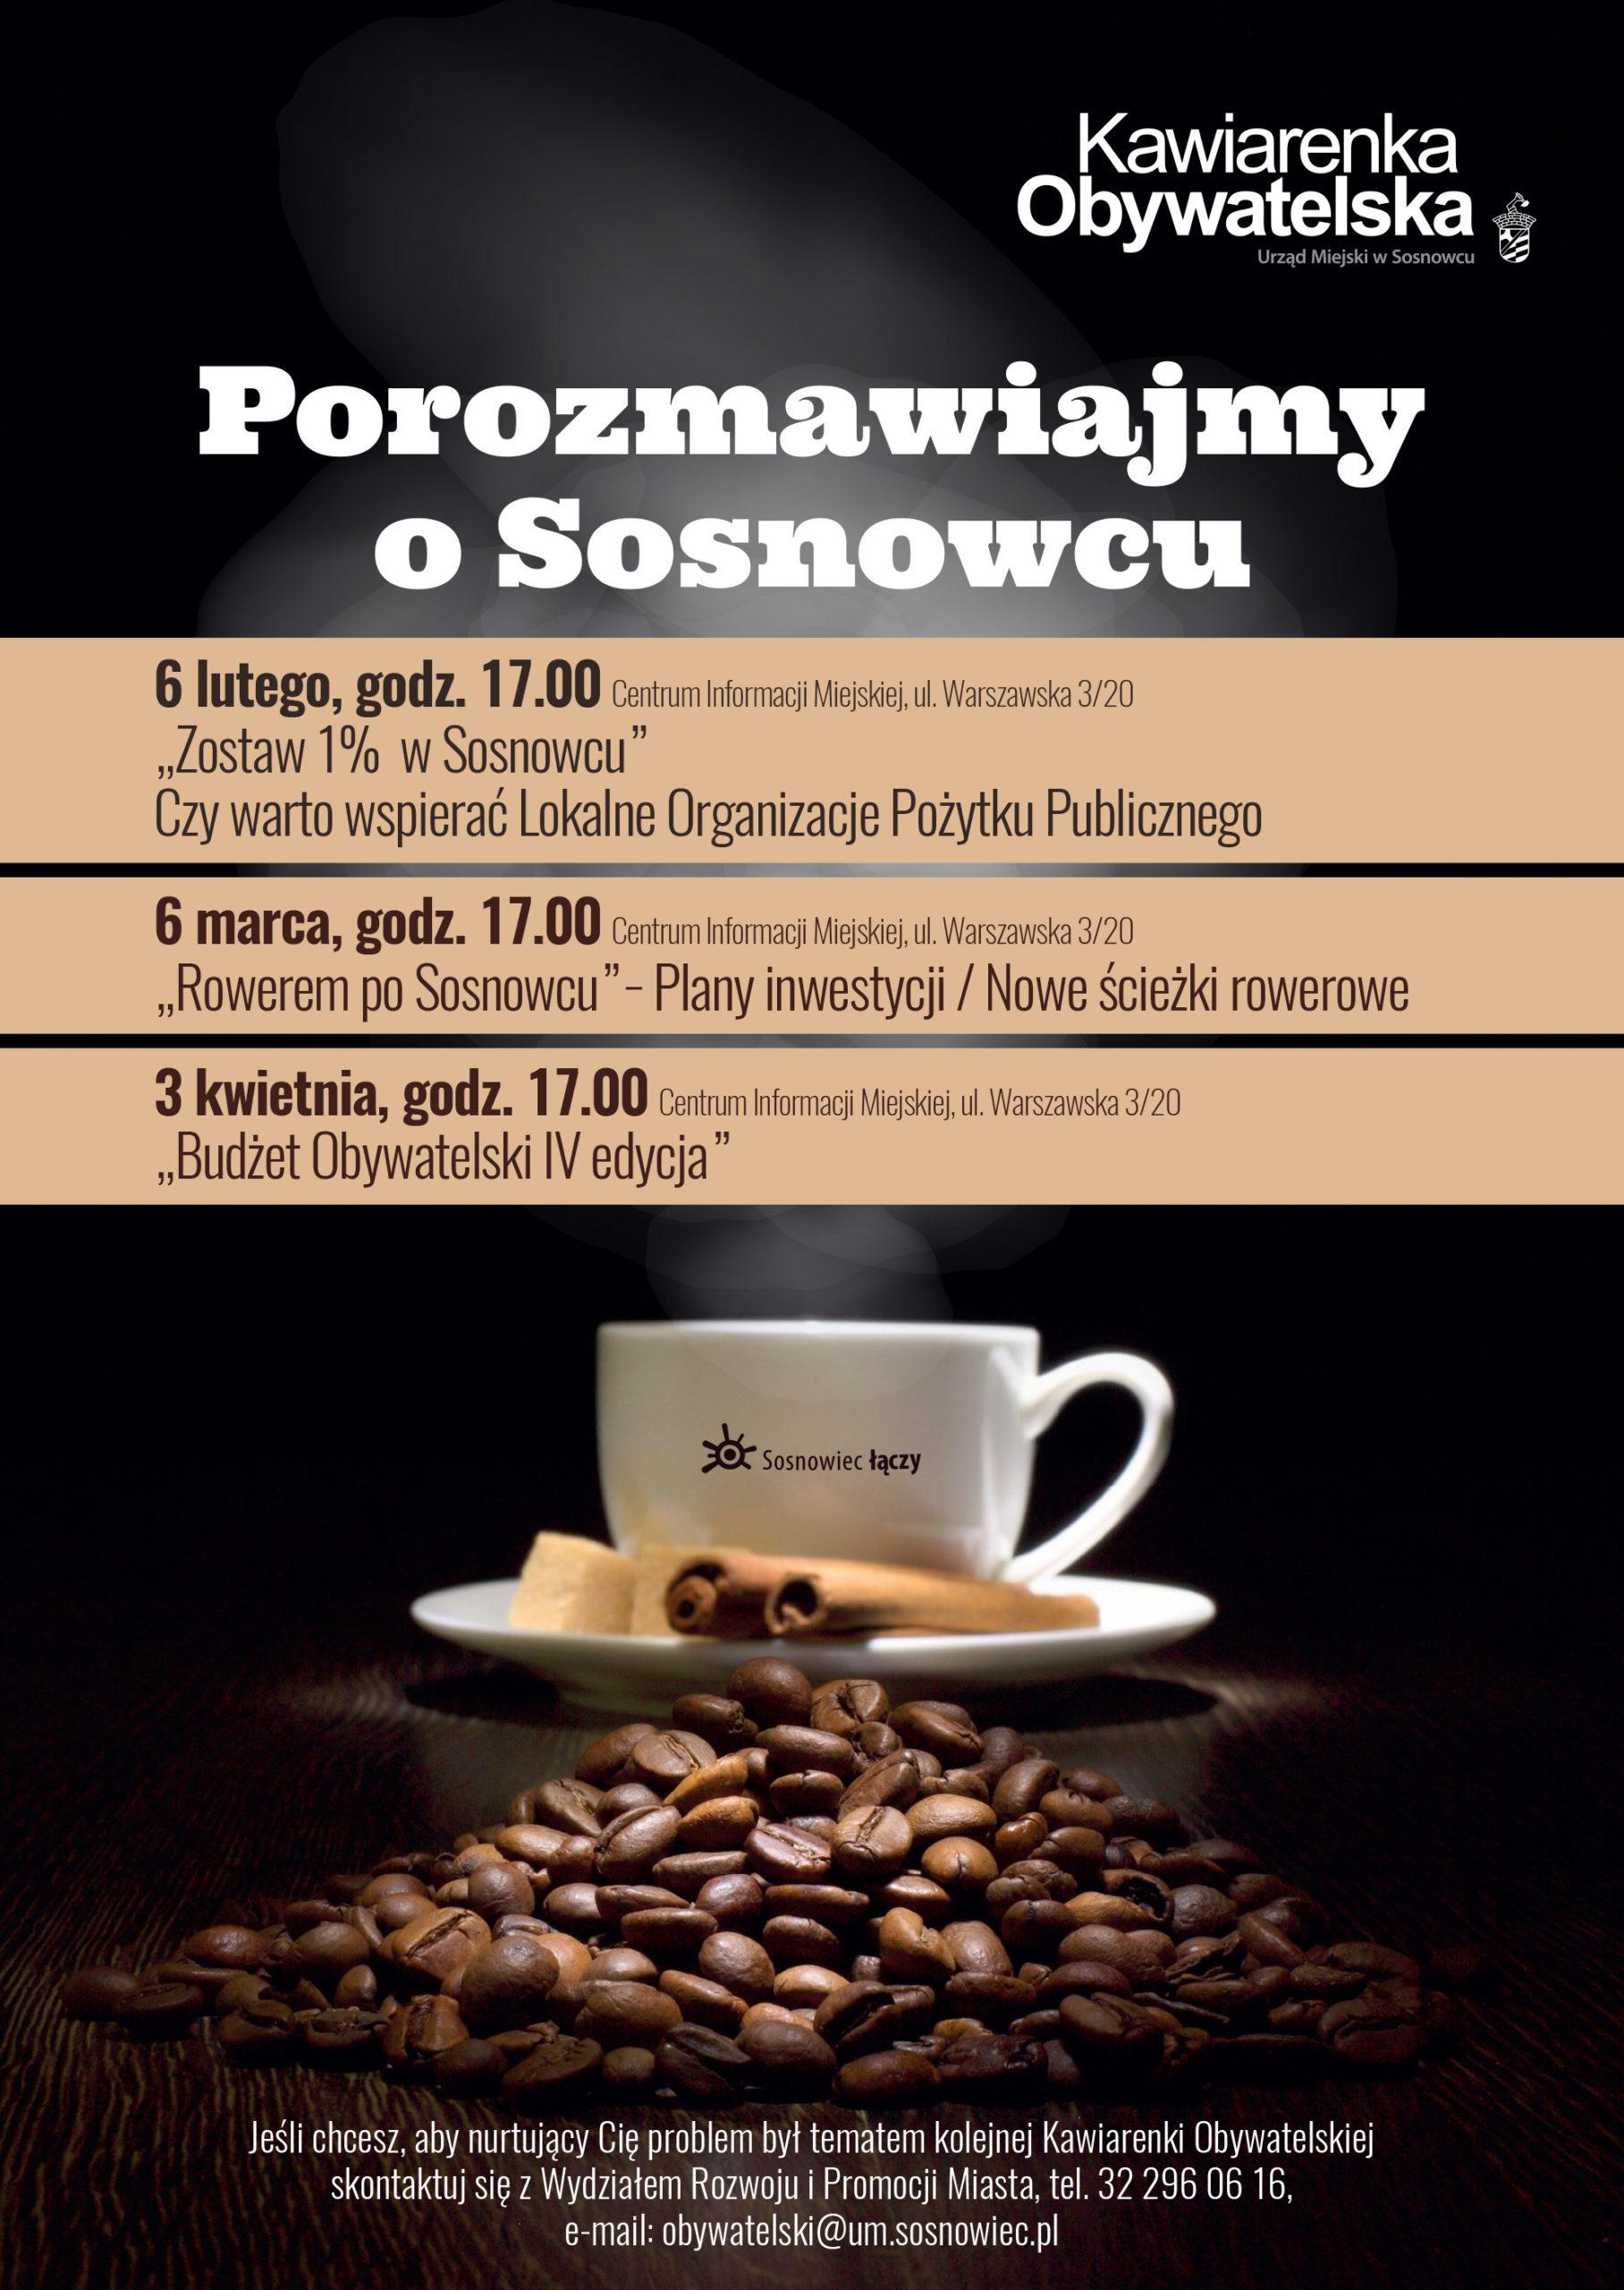 kawiarenka obywatelska OPP plakat